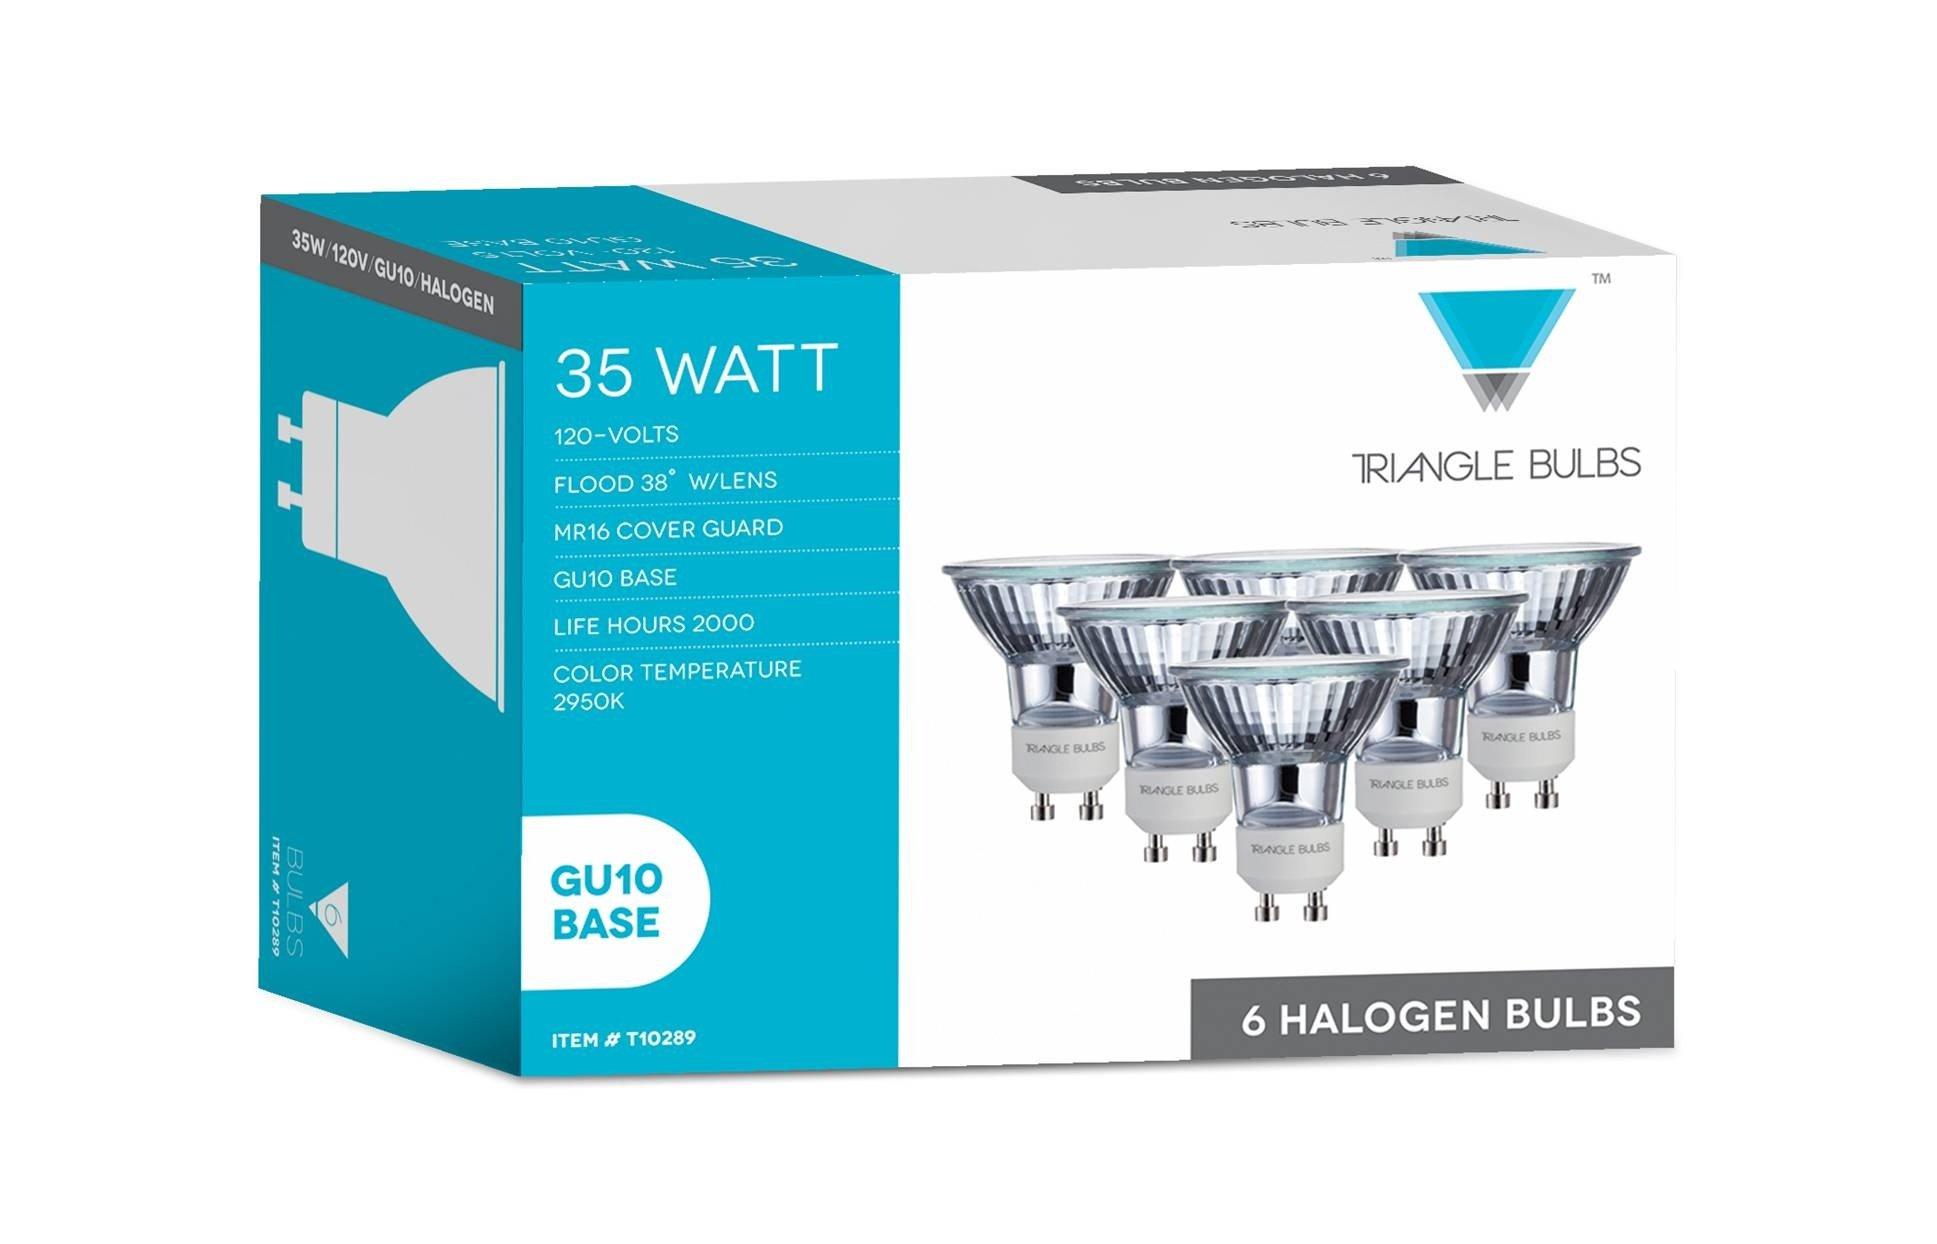 Triangle Bulbs T10289-6 (6 pack) - Q35MR16/FL/GU10, 35 Watt, MR16 With UV Glass Cover, 120 Volt, GU10 Base, Halogen Flood Light Bulb, 6 Pack